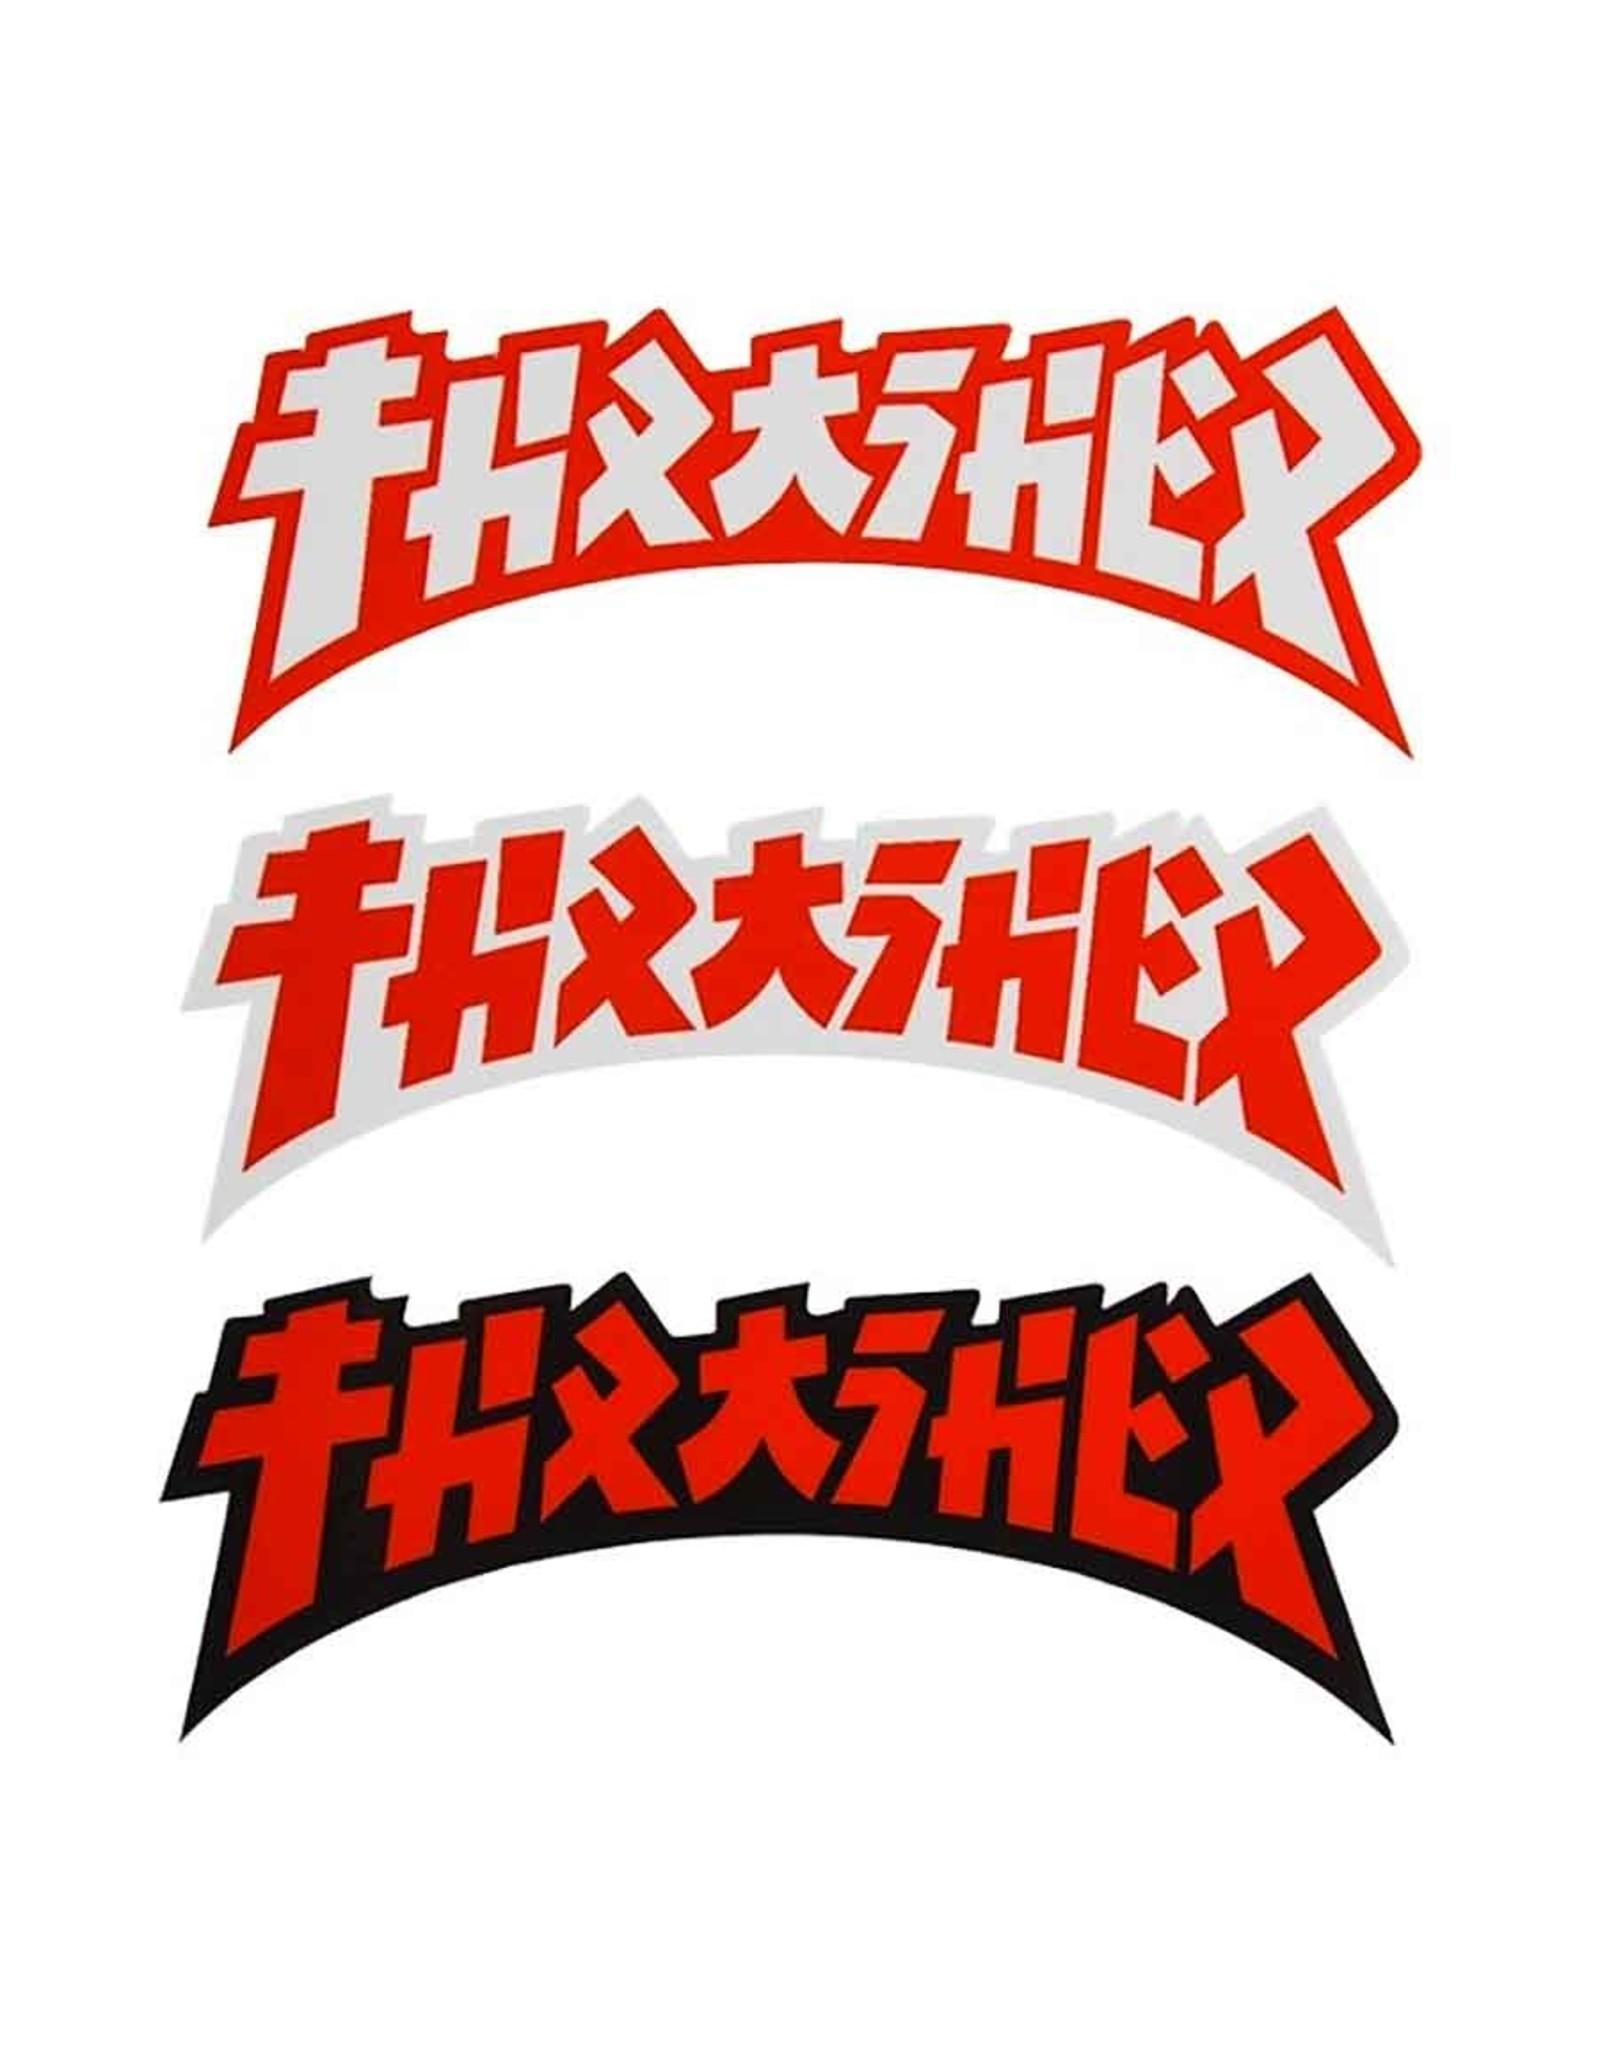 Thrasher Thrasher Sticker Godzilla Die Cut